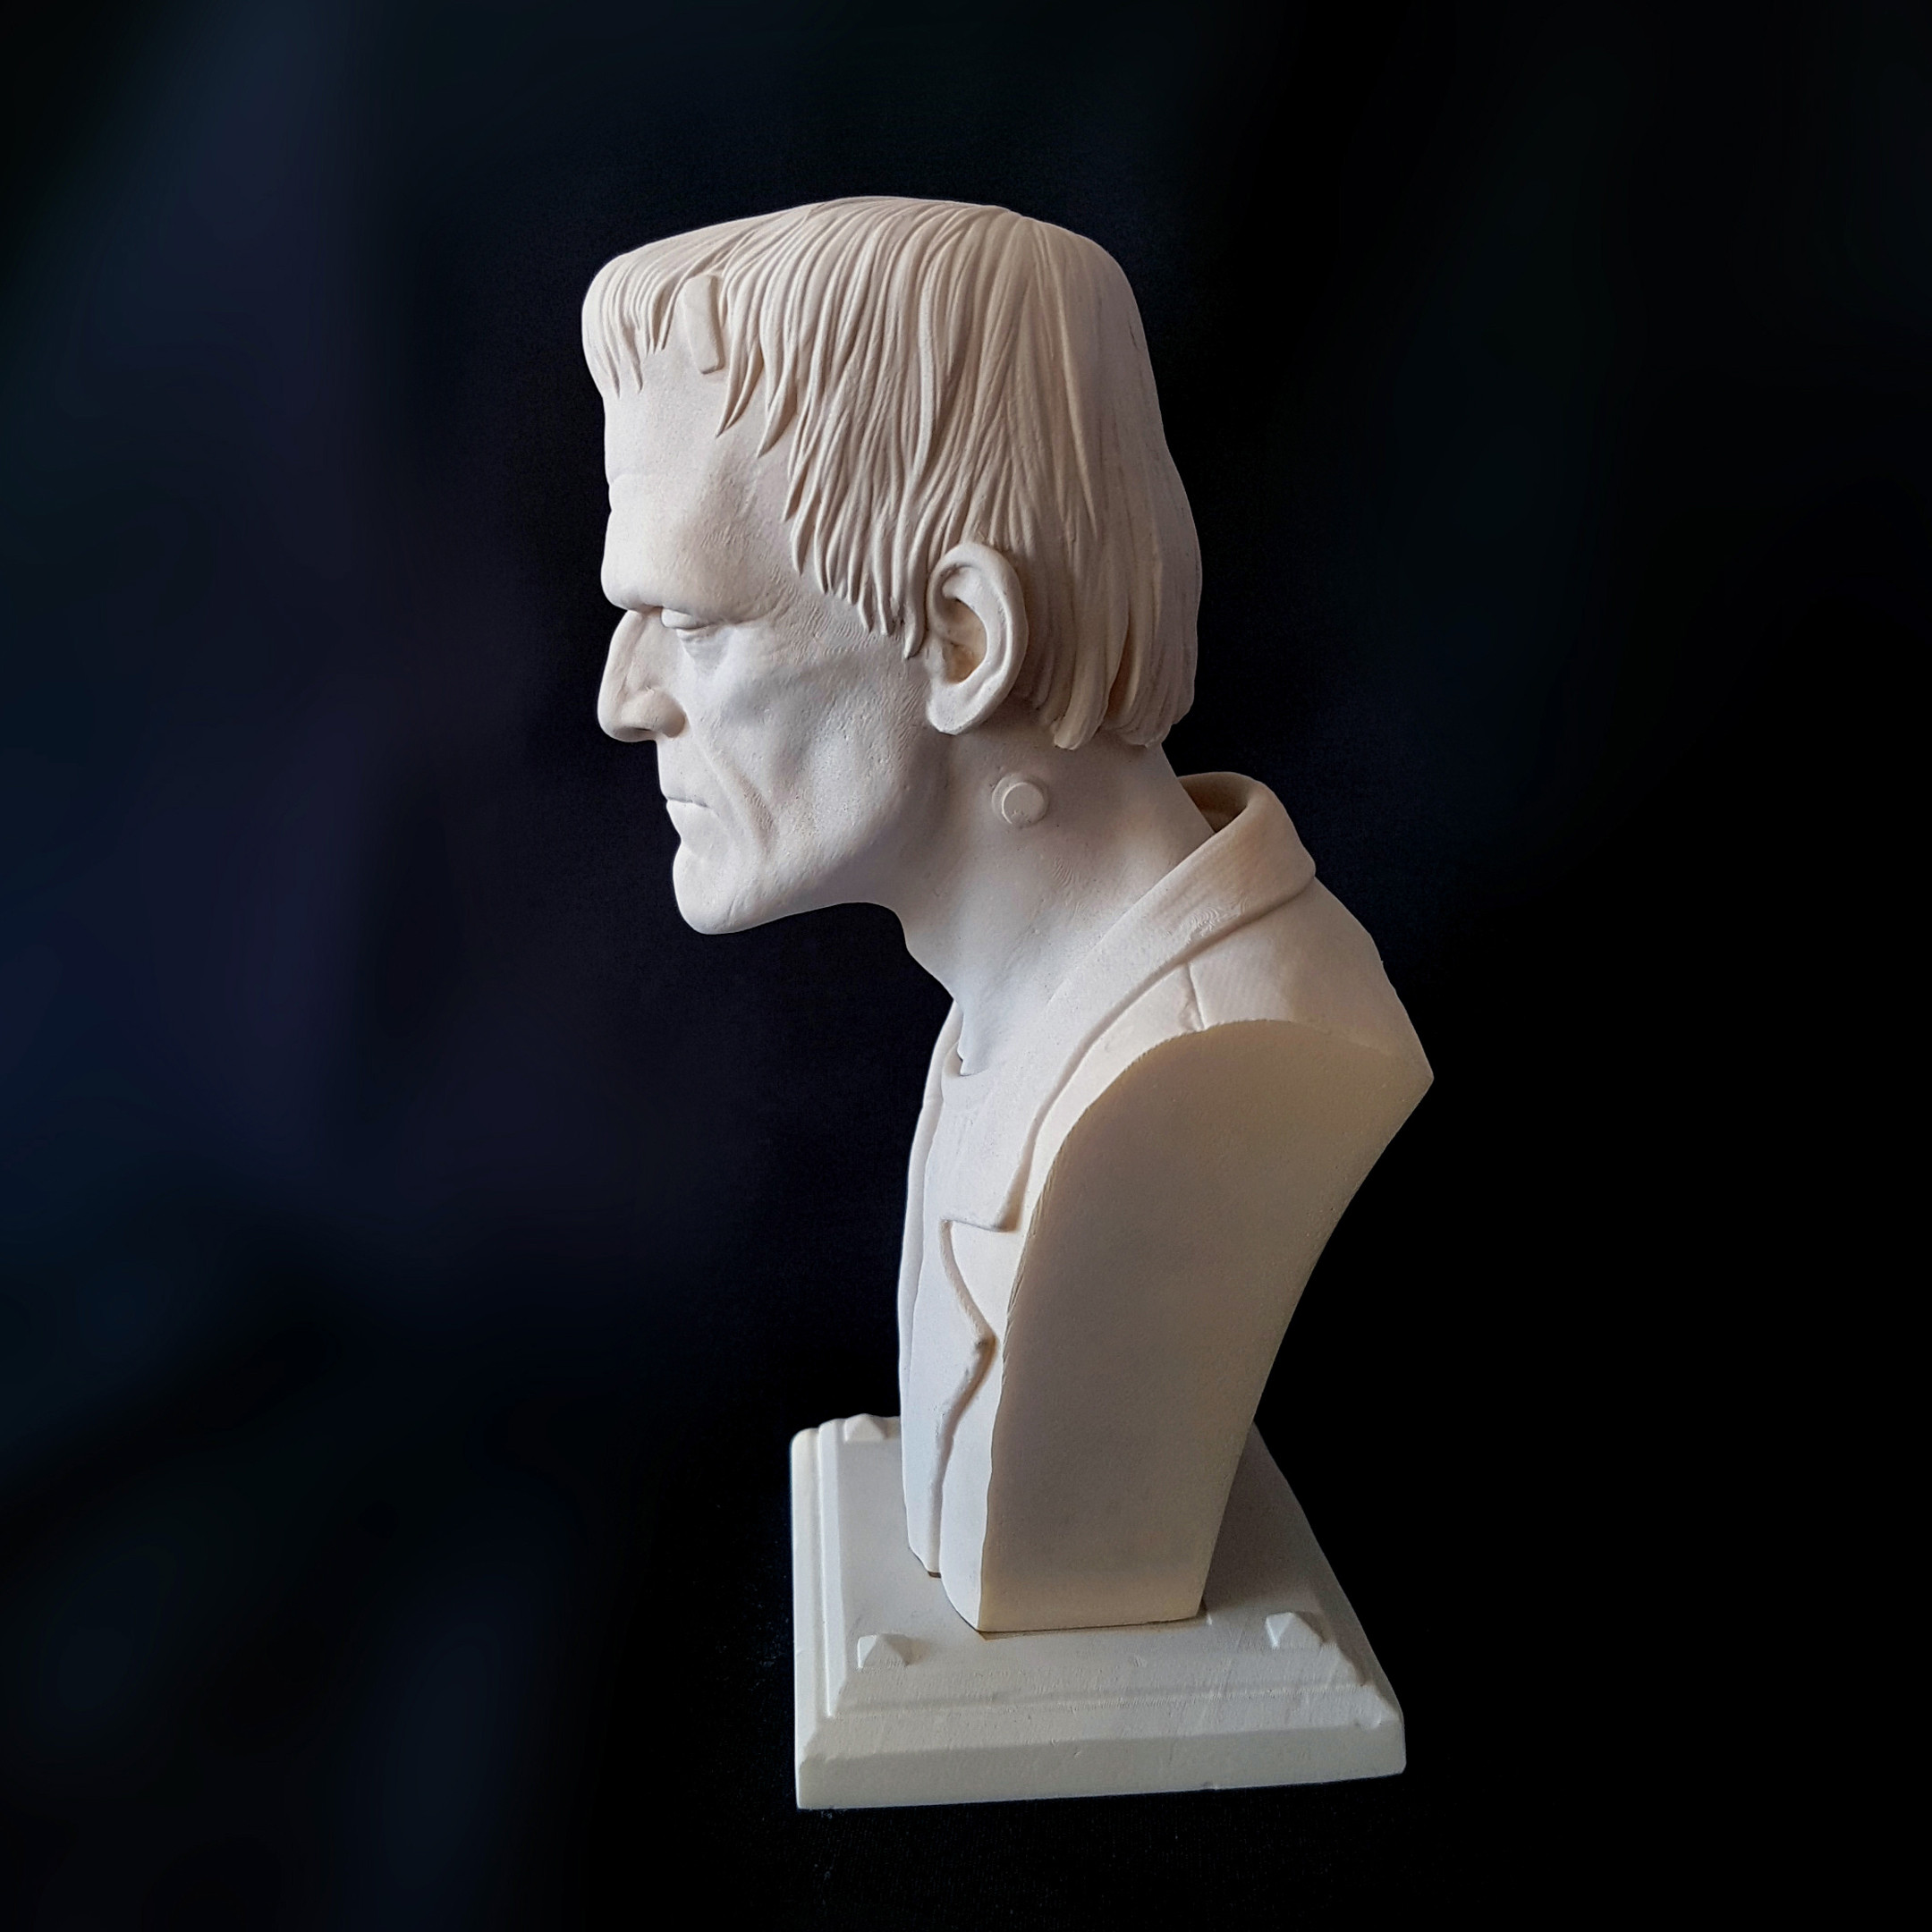 Actual resin 3D print